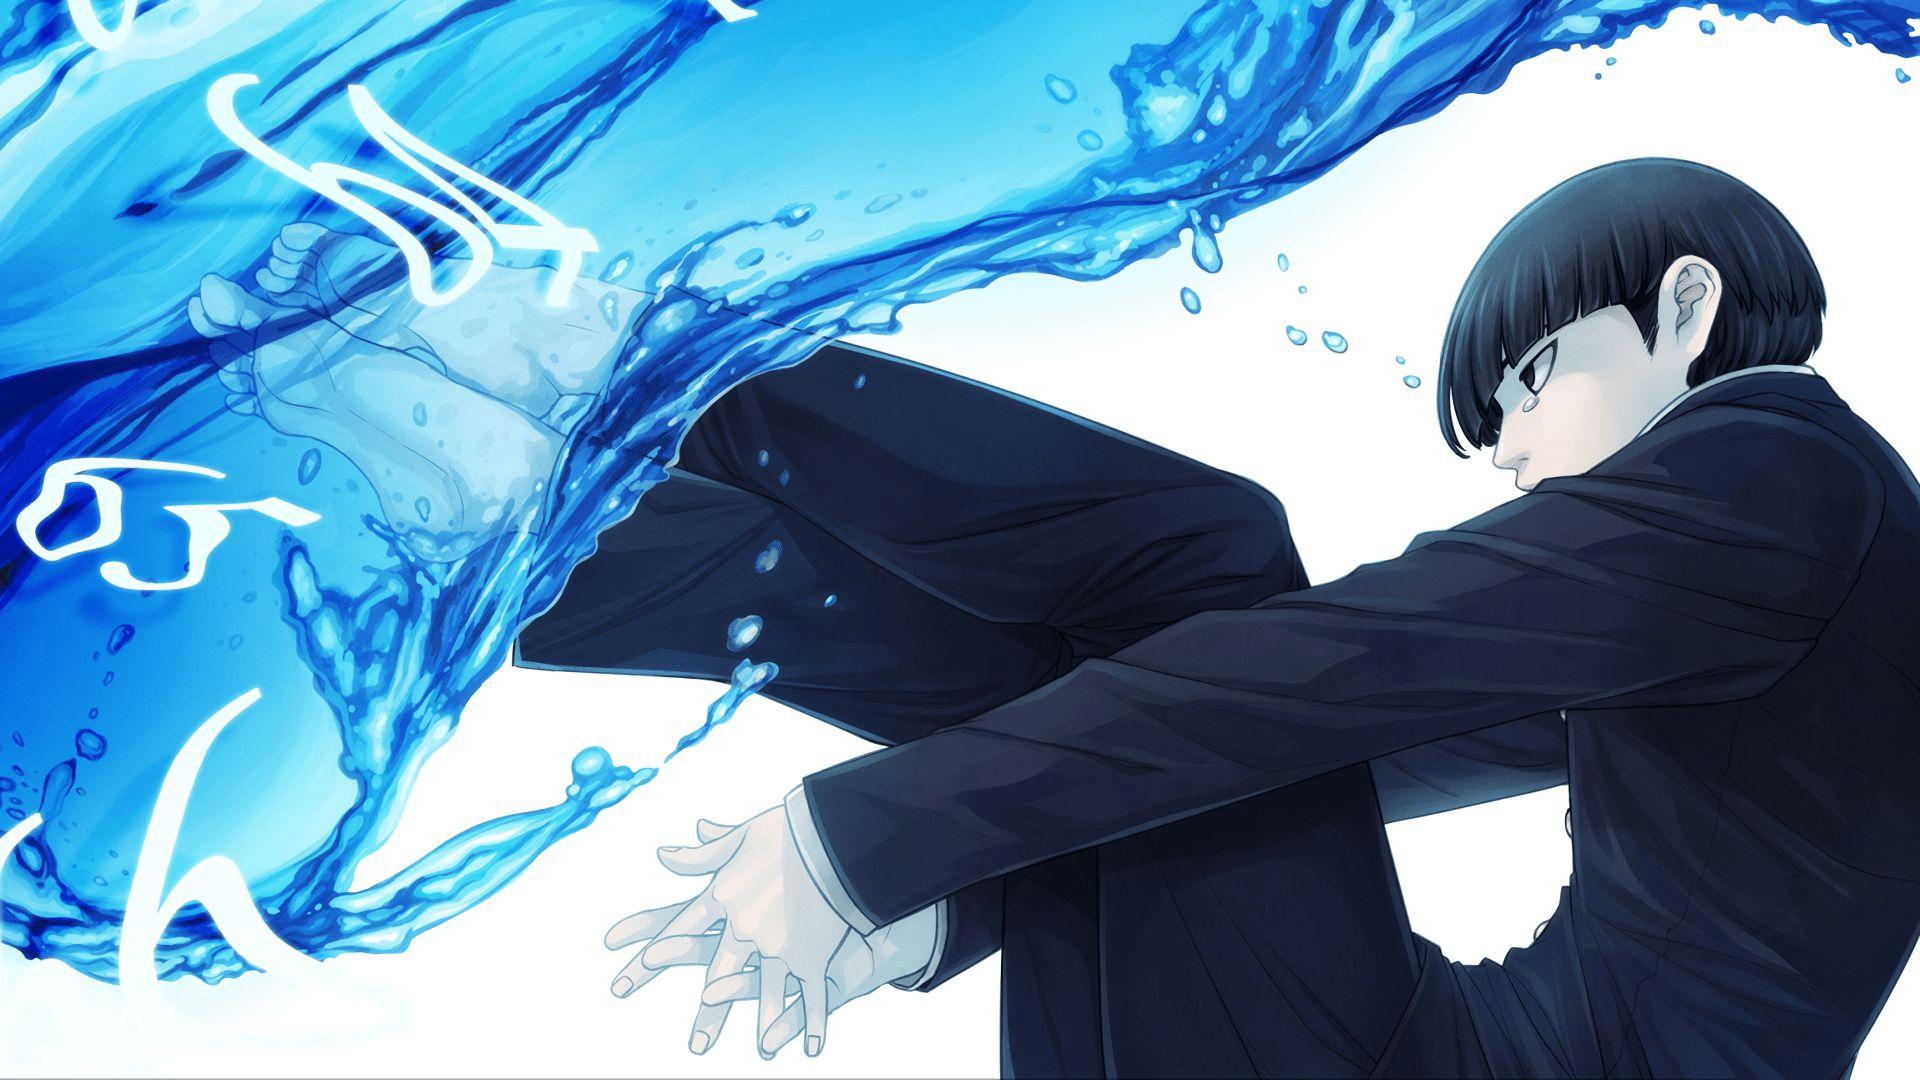 Anime Mob Psycho 100 Art